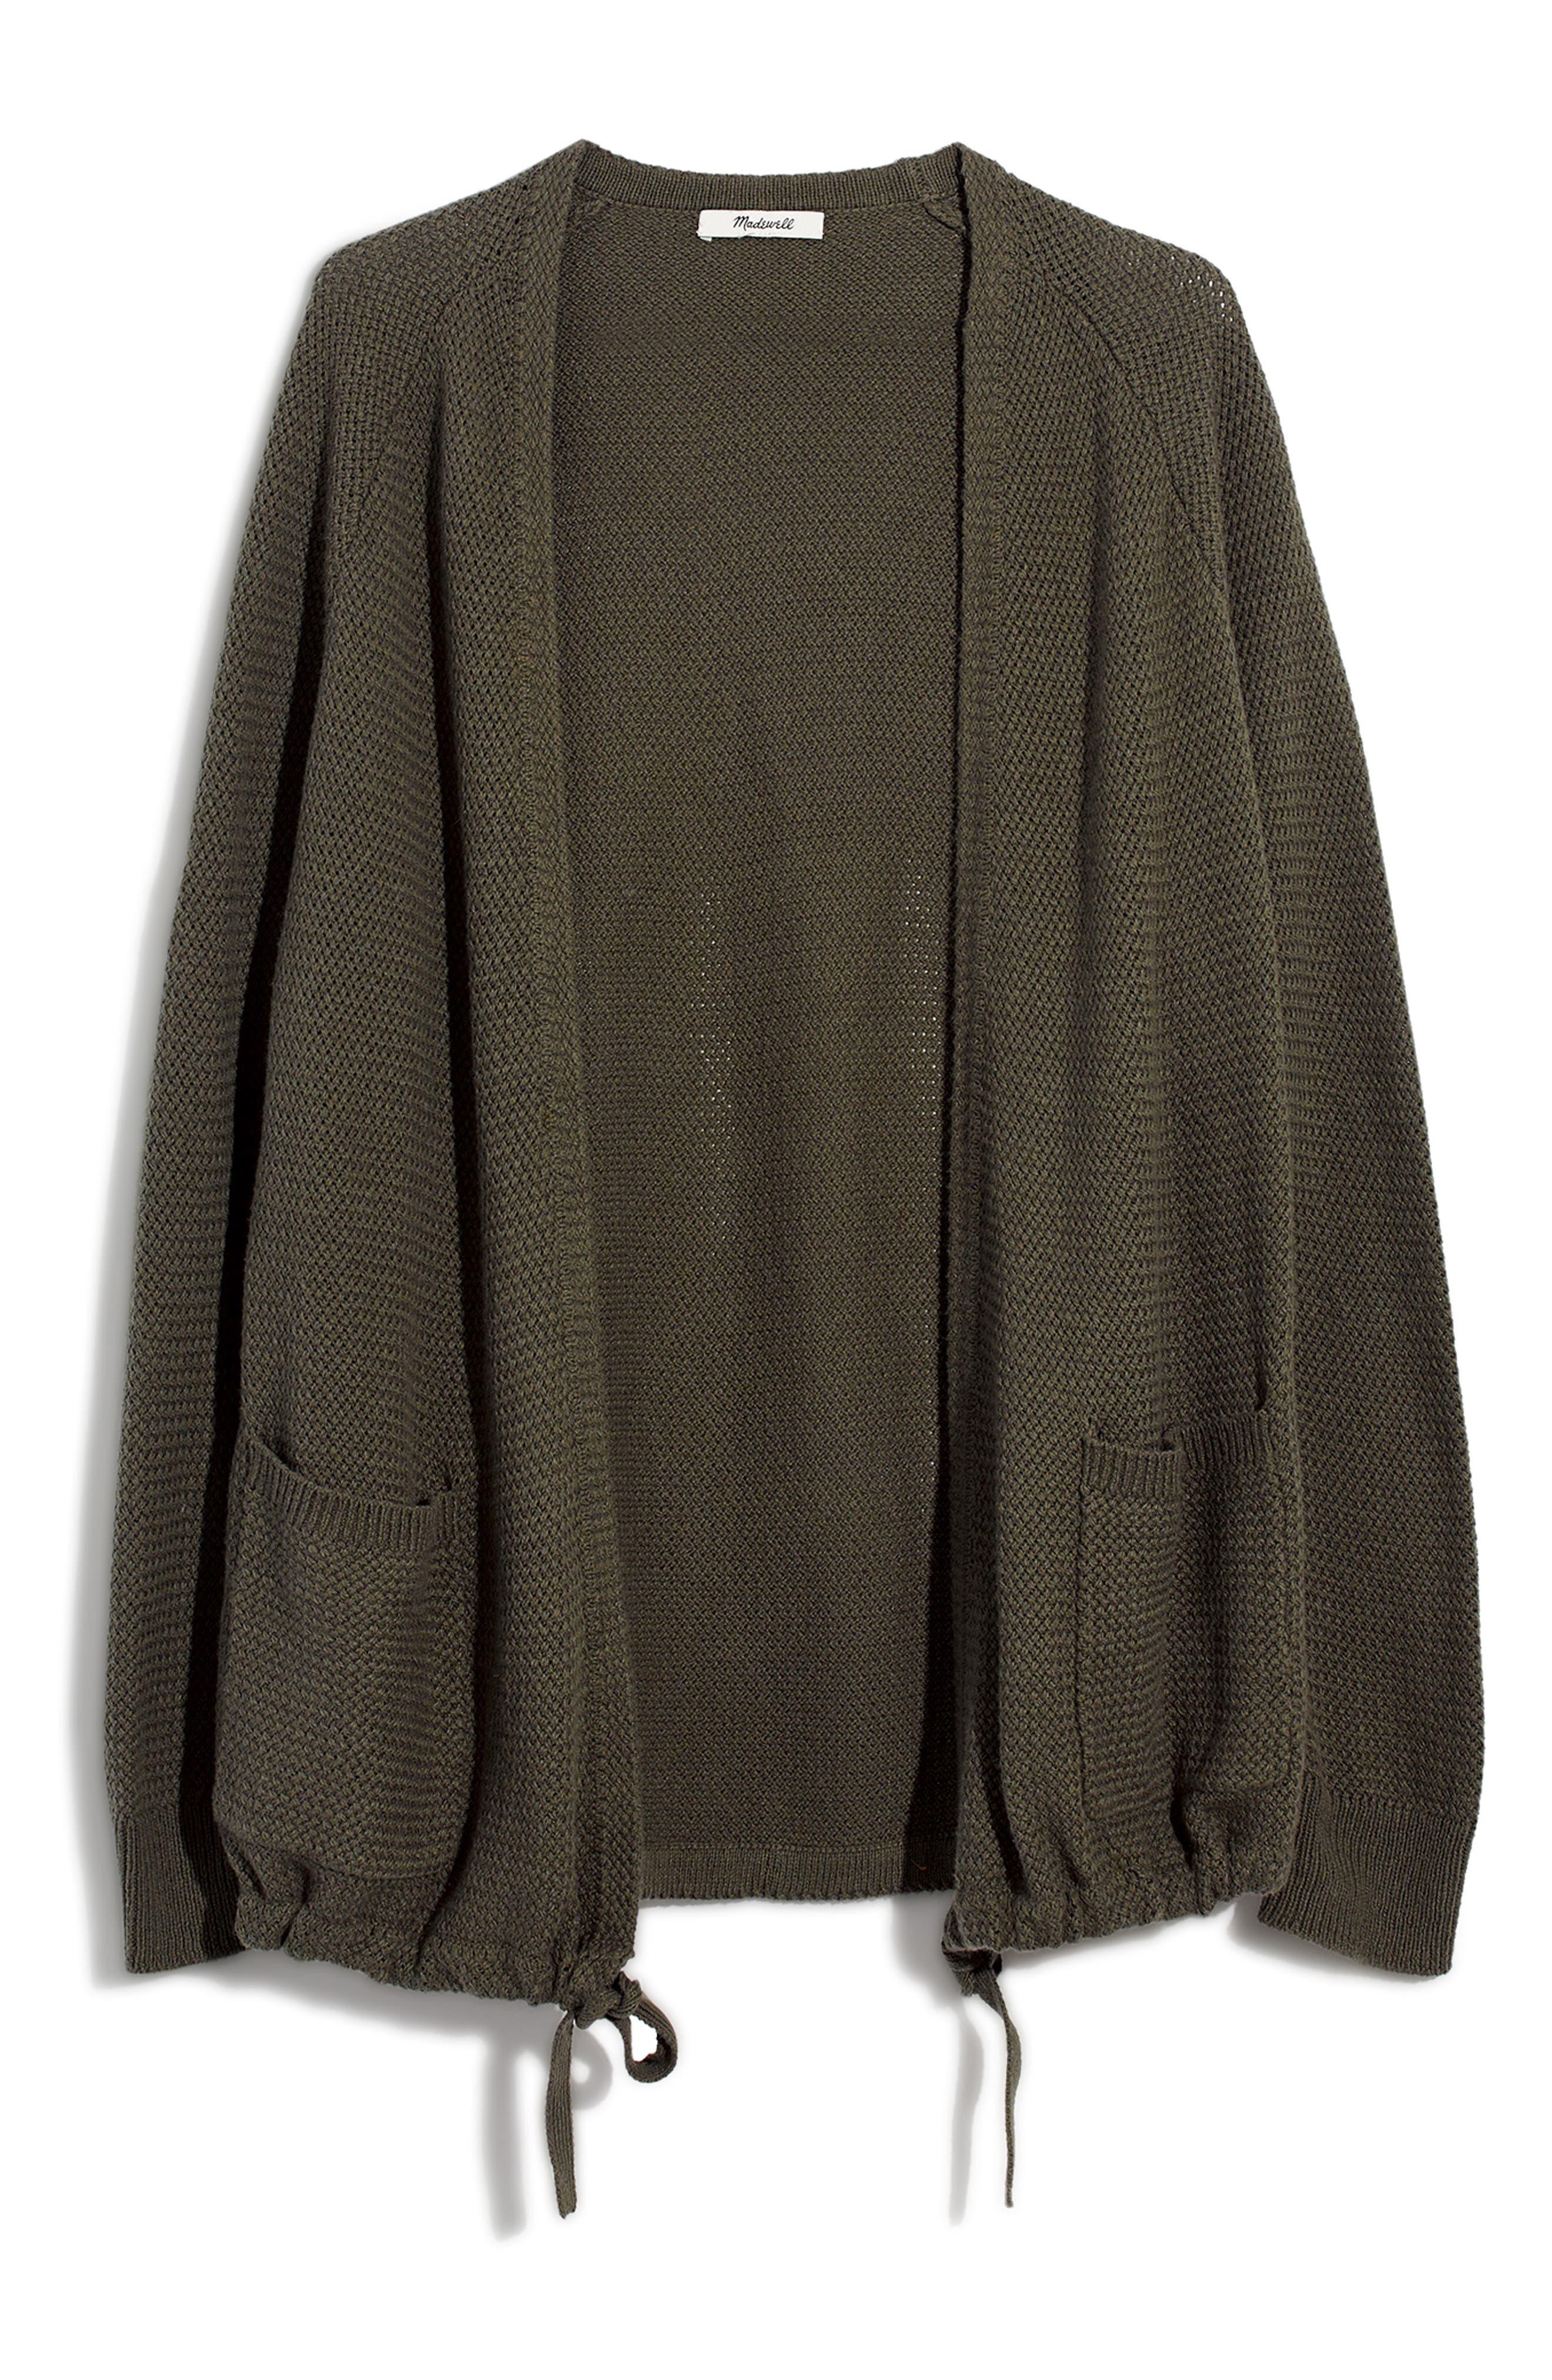 Palisades Cardigan Sweater,                         Main,                         color, 300